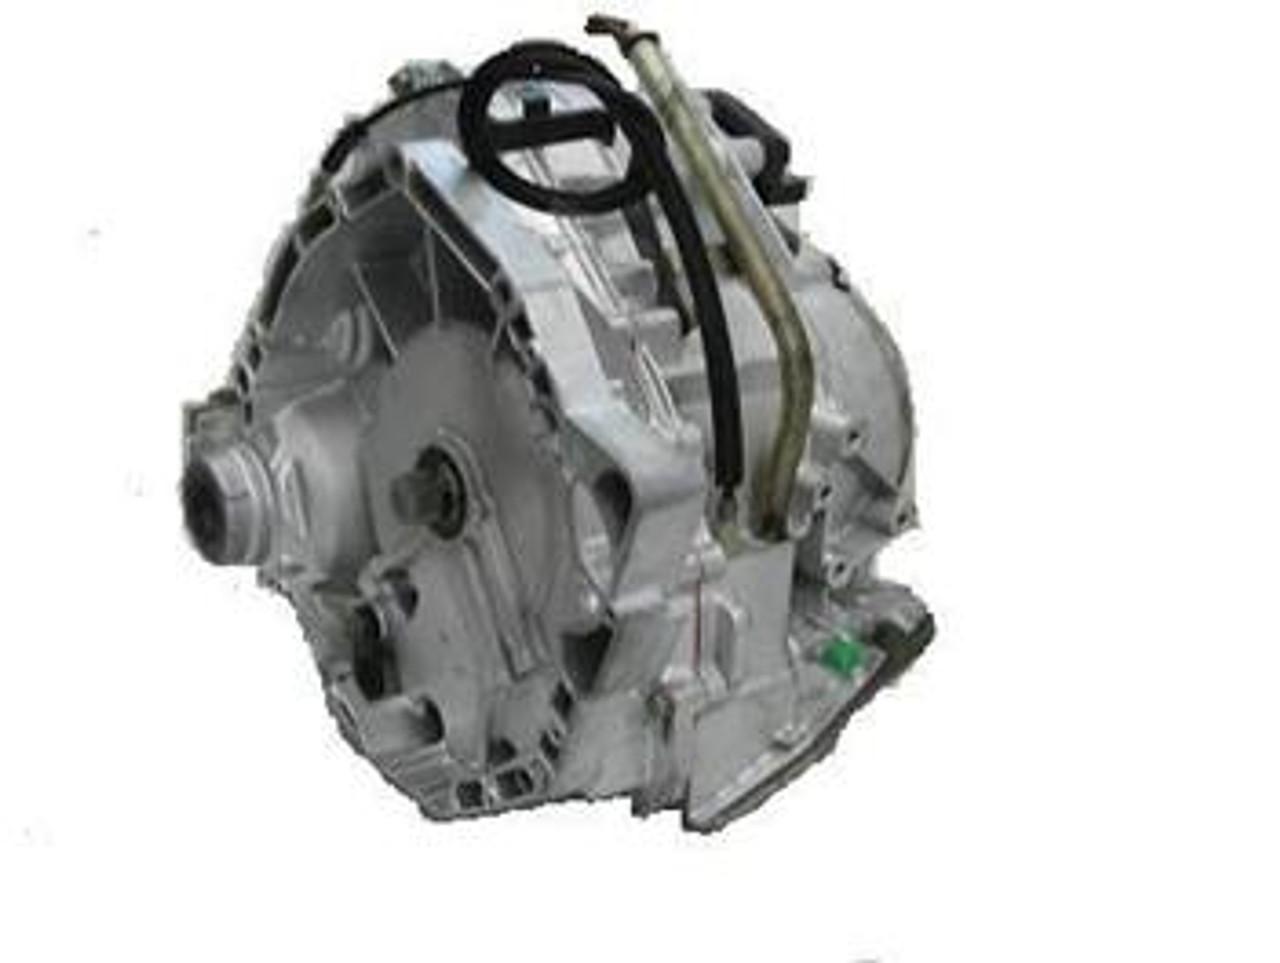 Rover 214/216 CVT Transmission